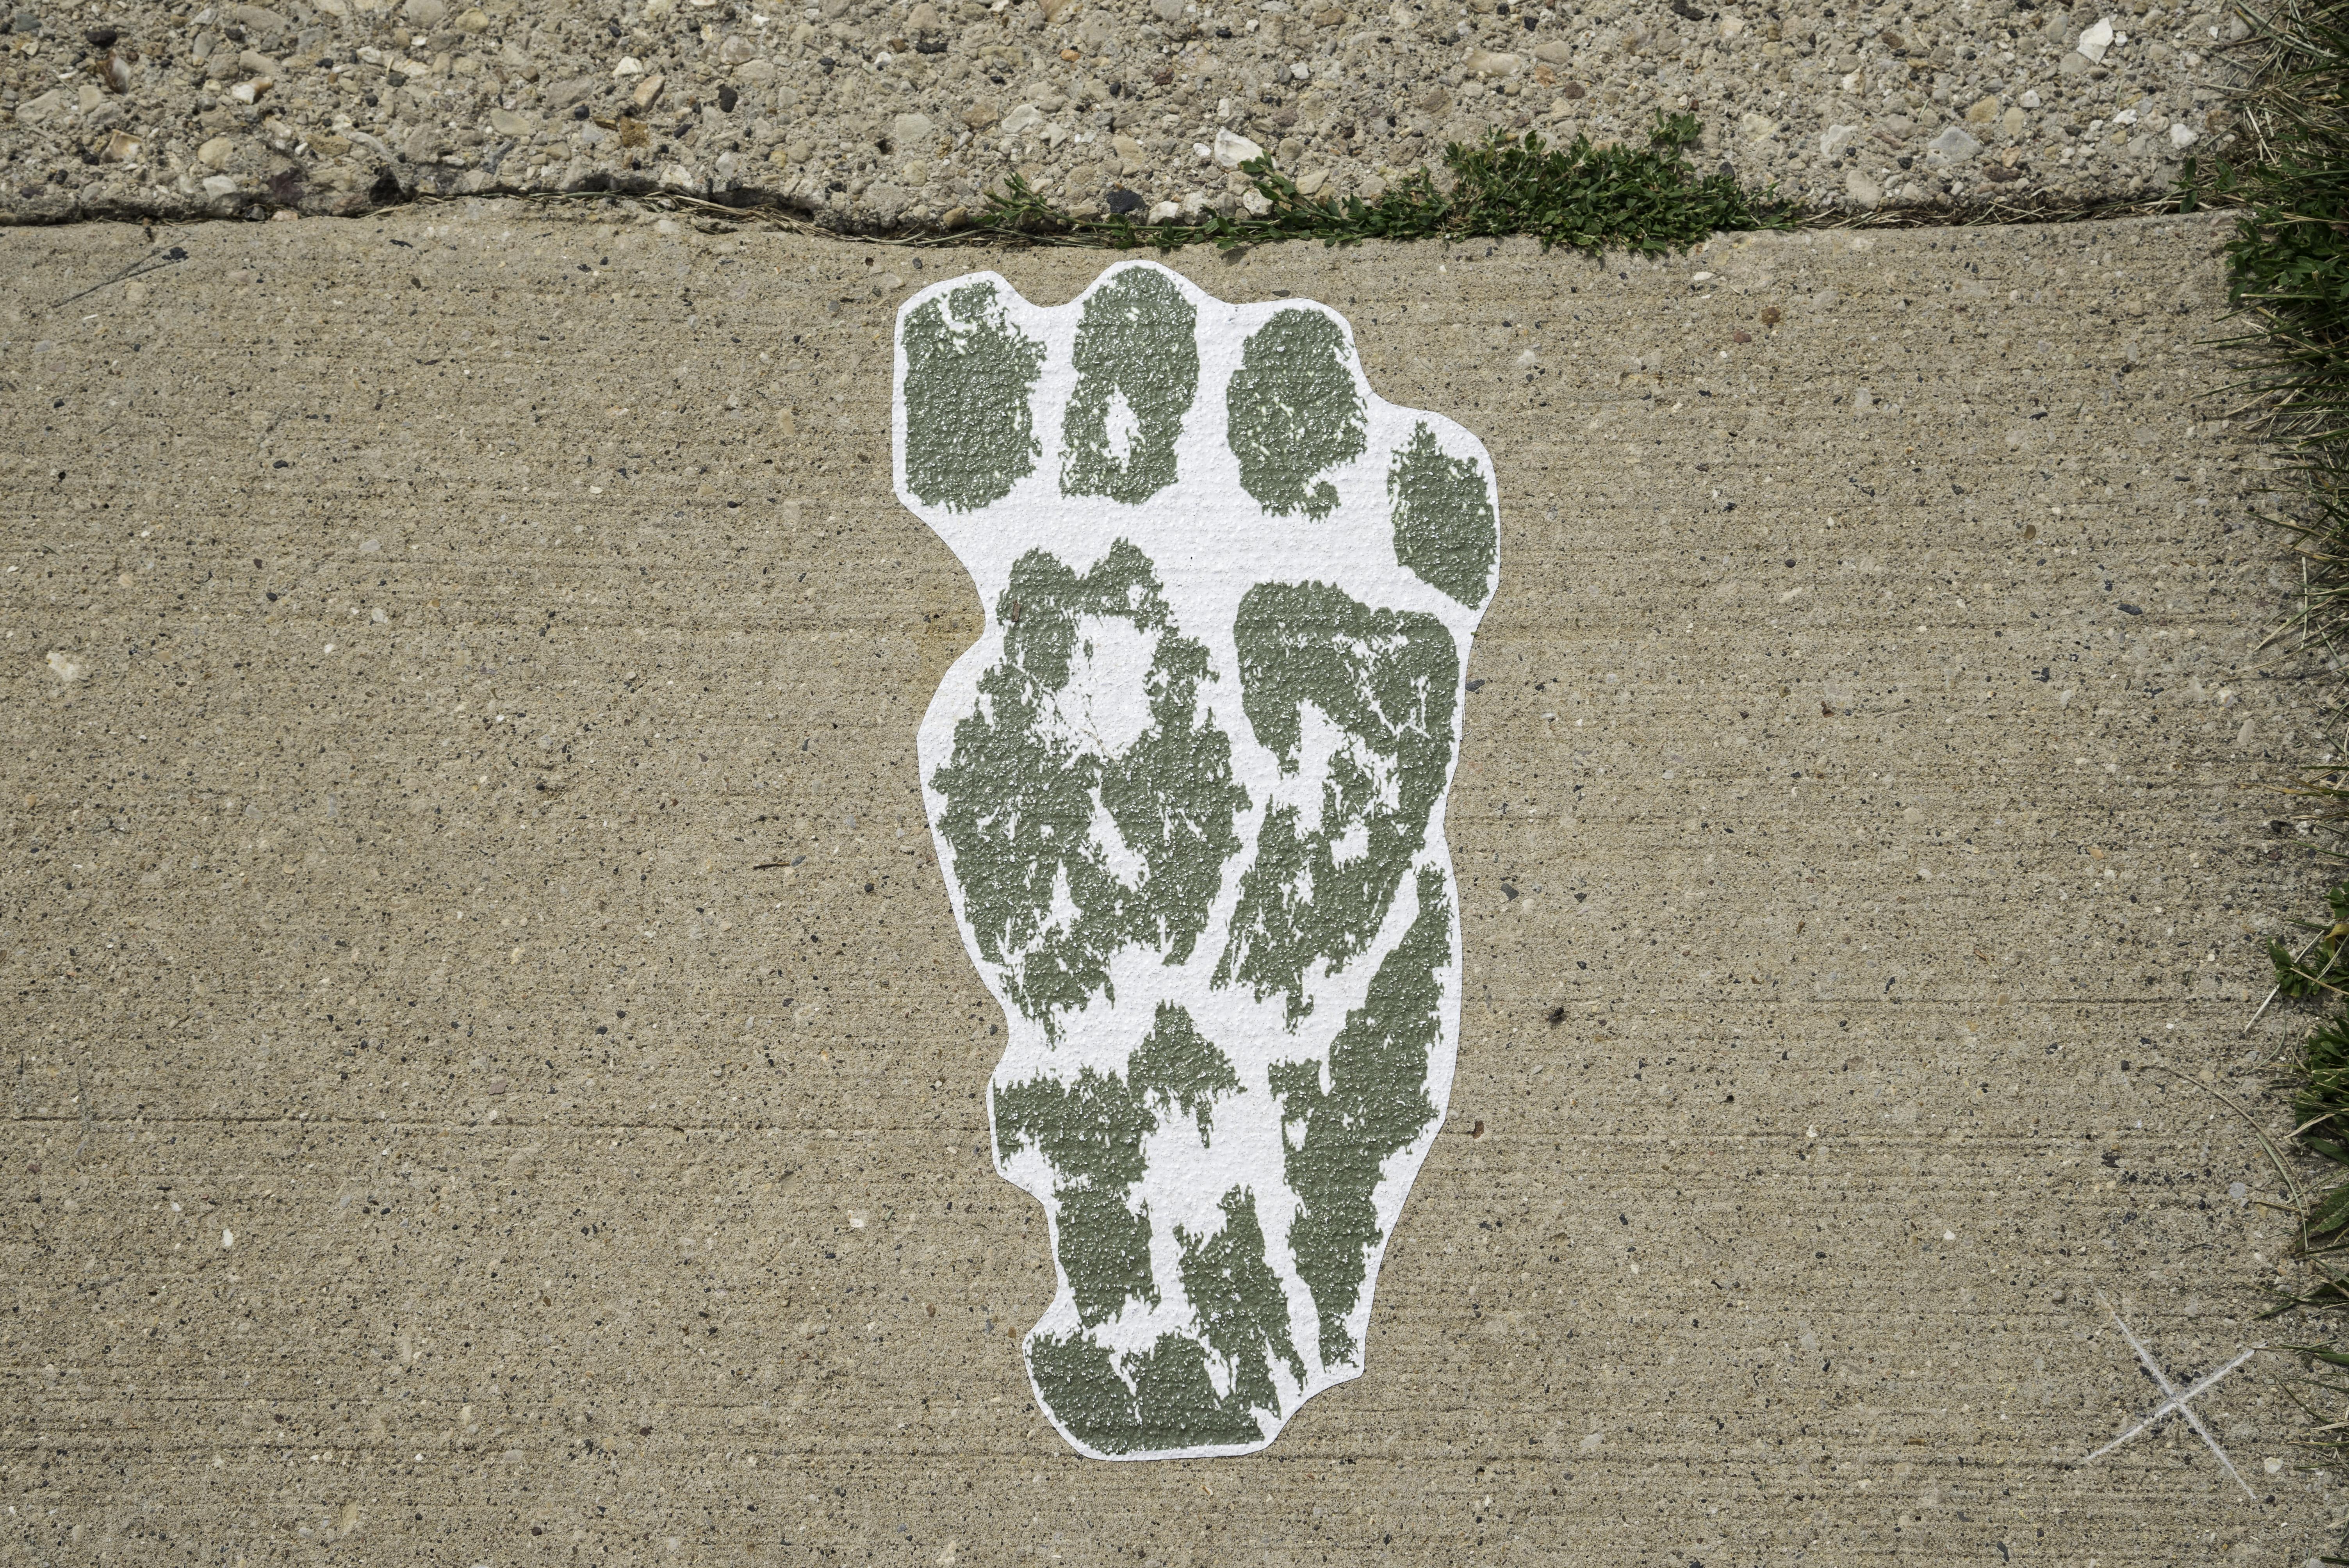 Troll Footprint on the sidewalk in Mount Horeb image - Free